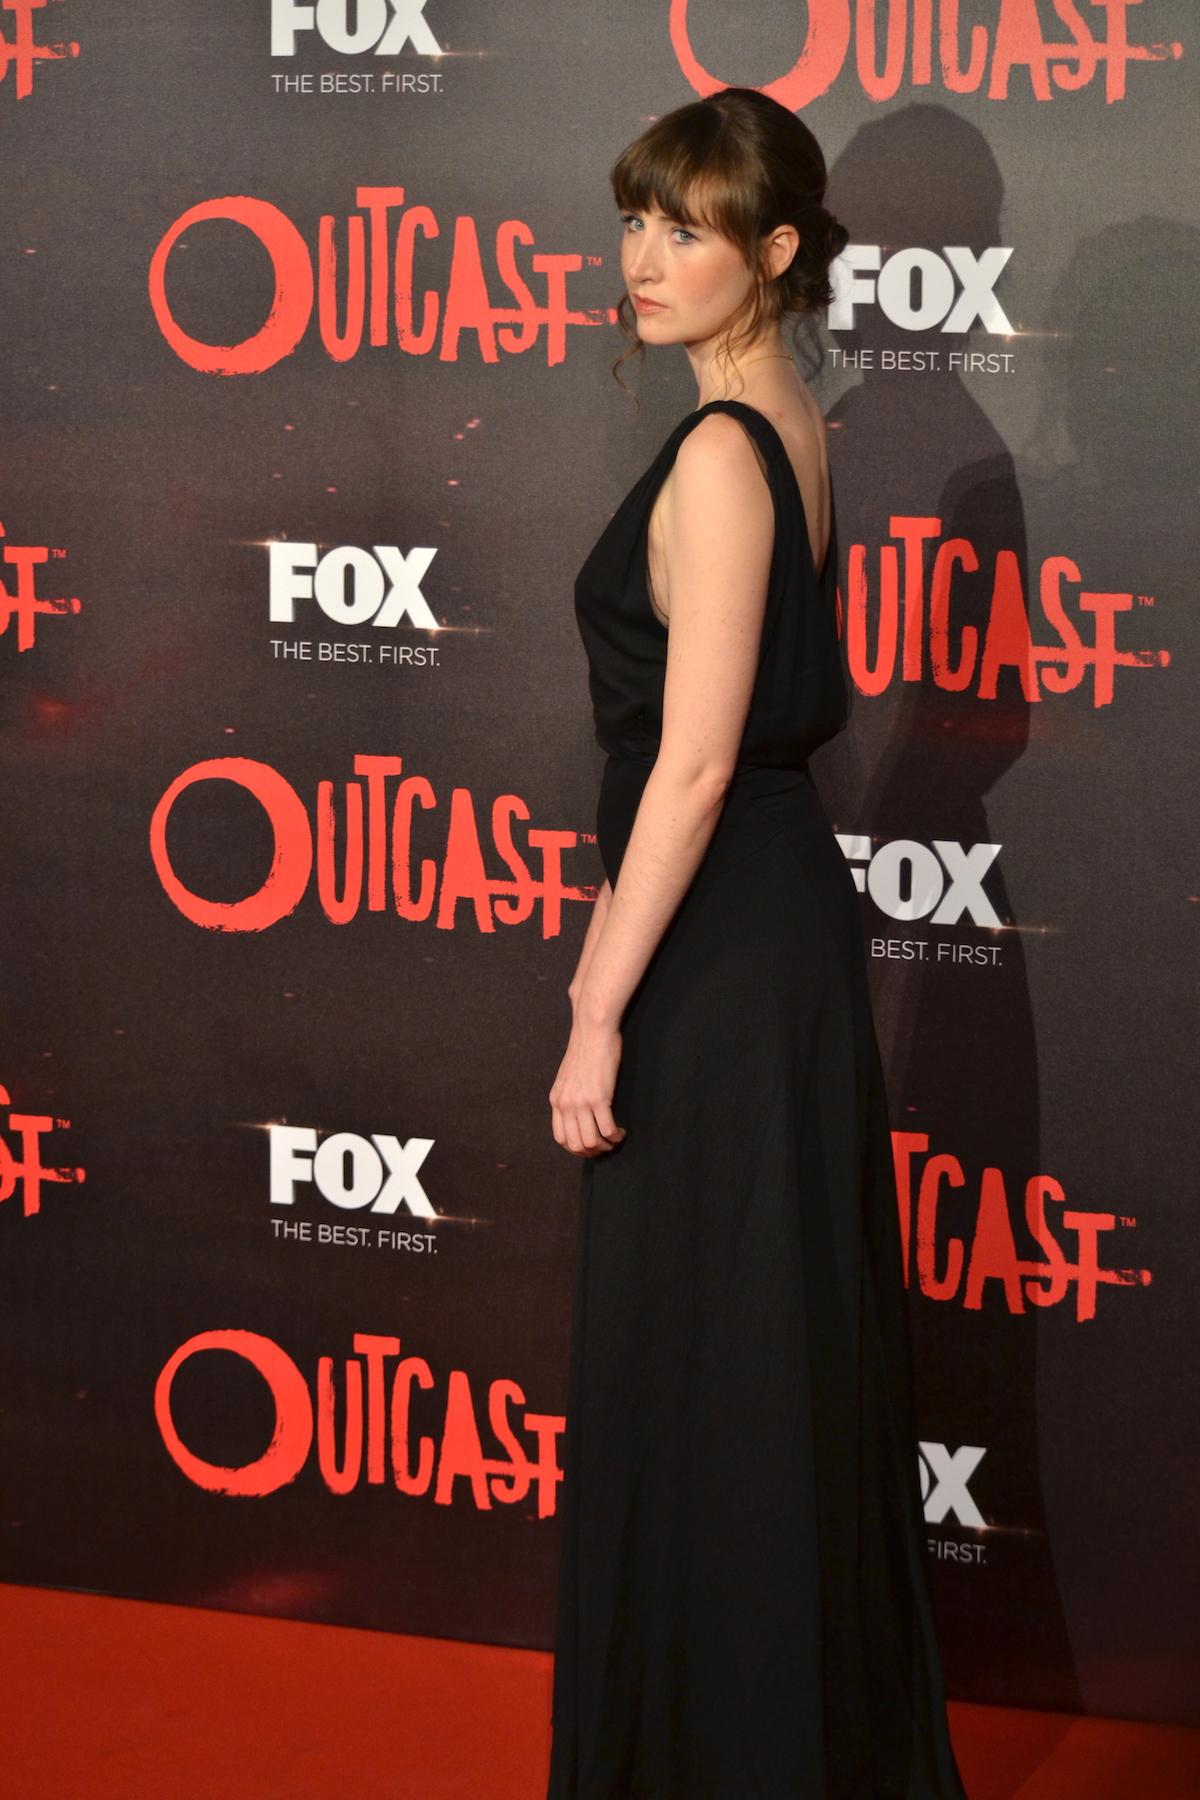 Outcast: Kate Lyn Sheil posa sul red carpet della premiere europea